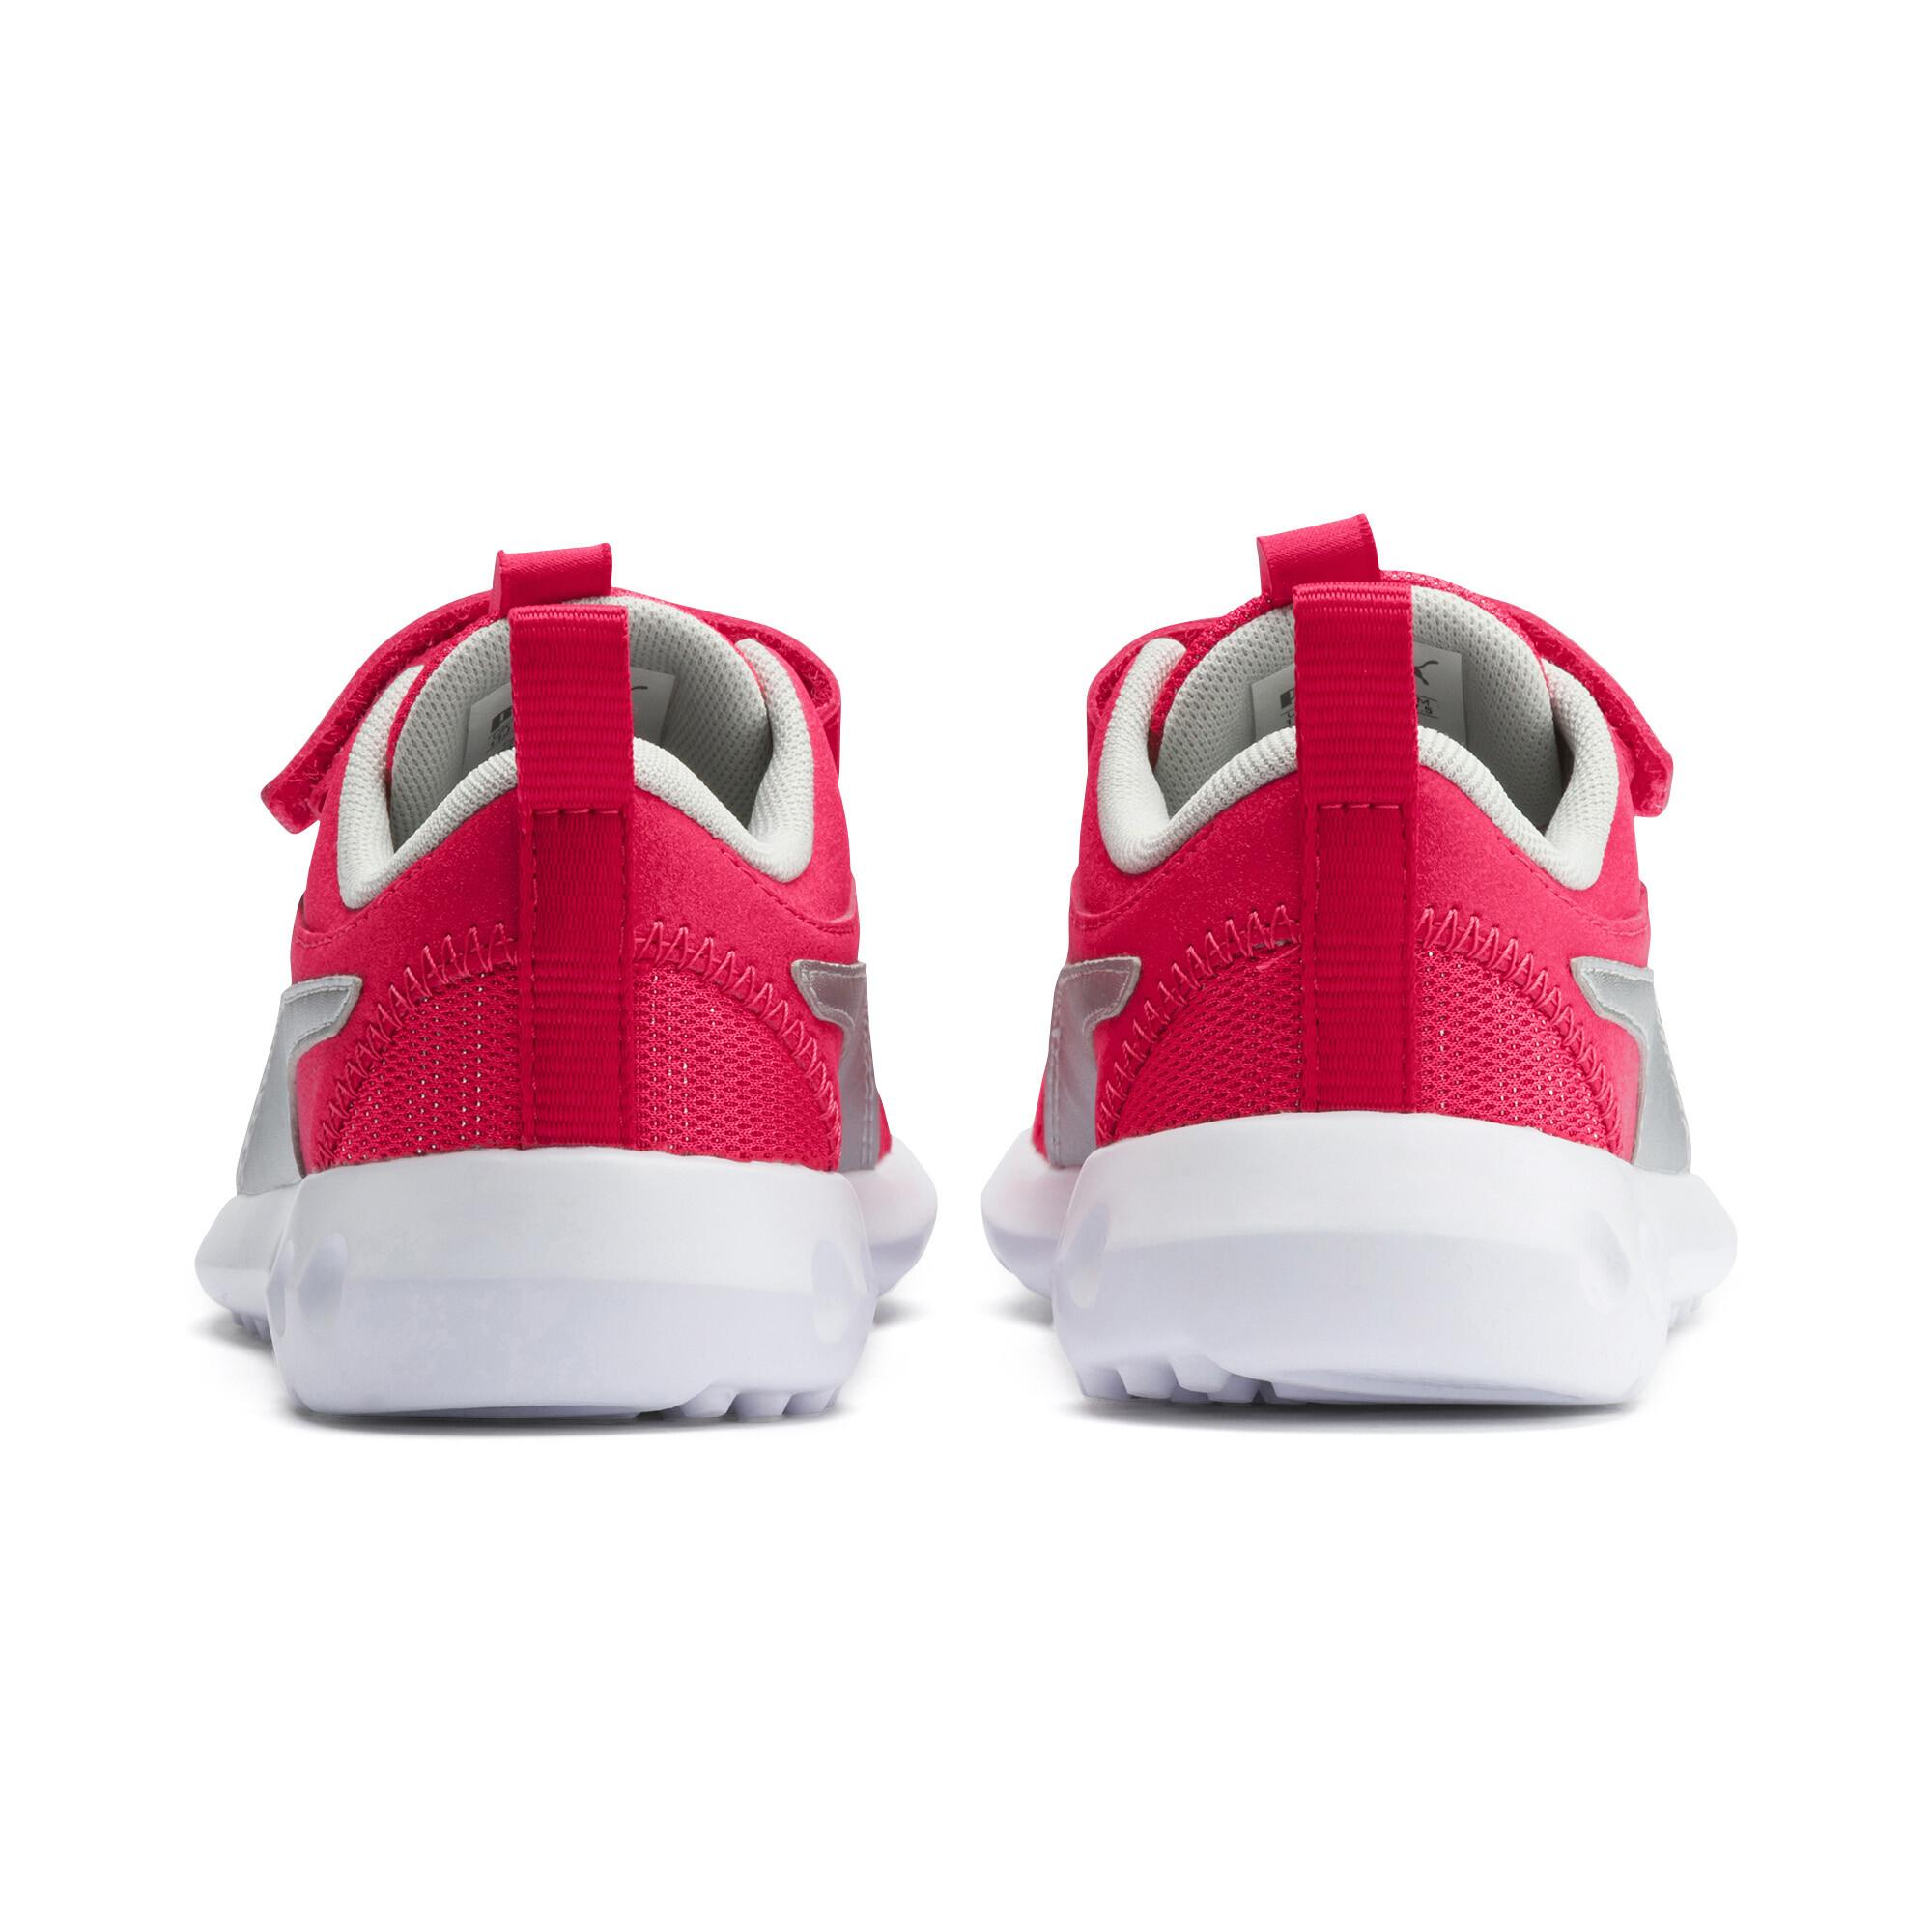 PUMA-Carson-2-Glitz-AC-Shoes-PS-Girls-Shoe-Kids thumbnail 3